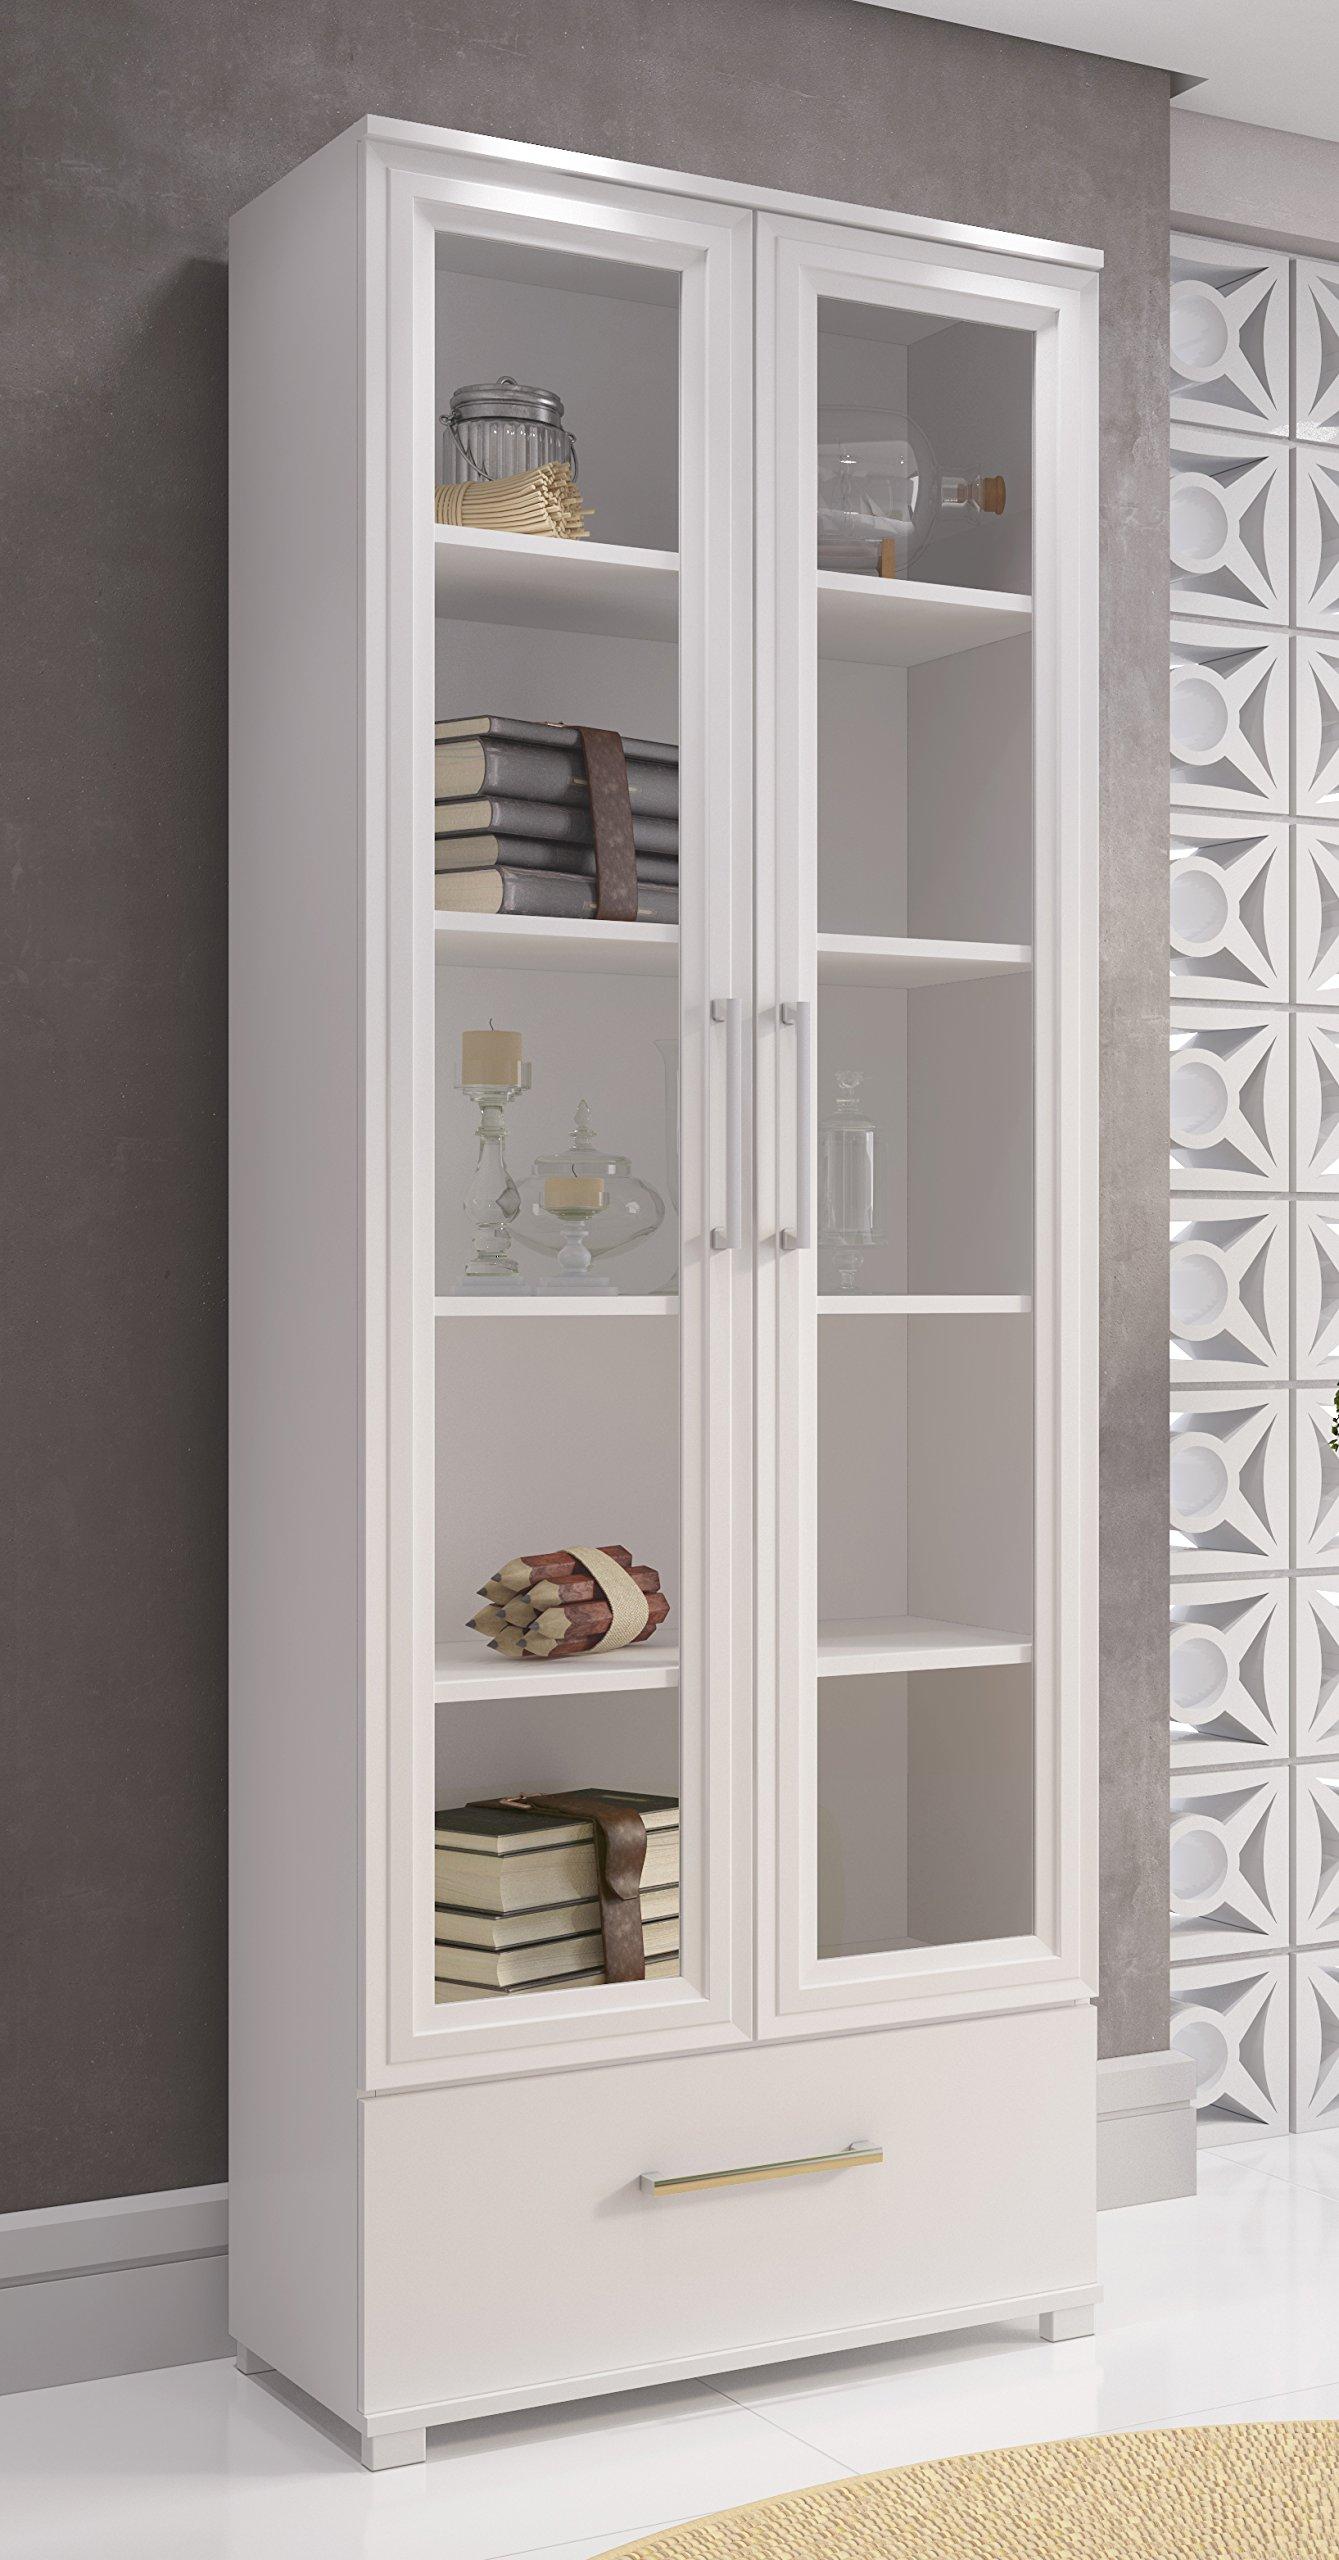 Accentuations by Manhattan Comfort 75AMC6 75AMC6-MC Serra Bookcase 1.0 White